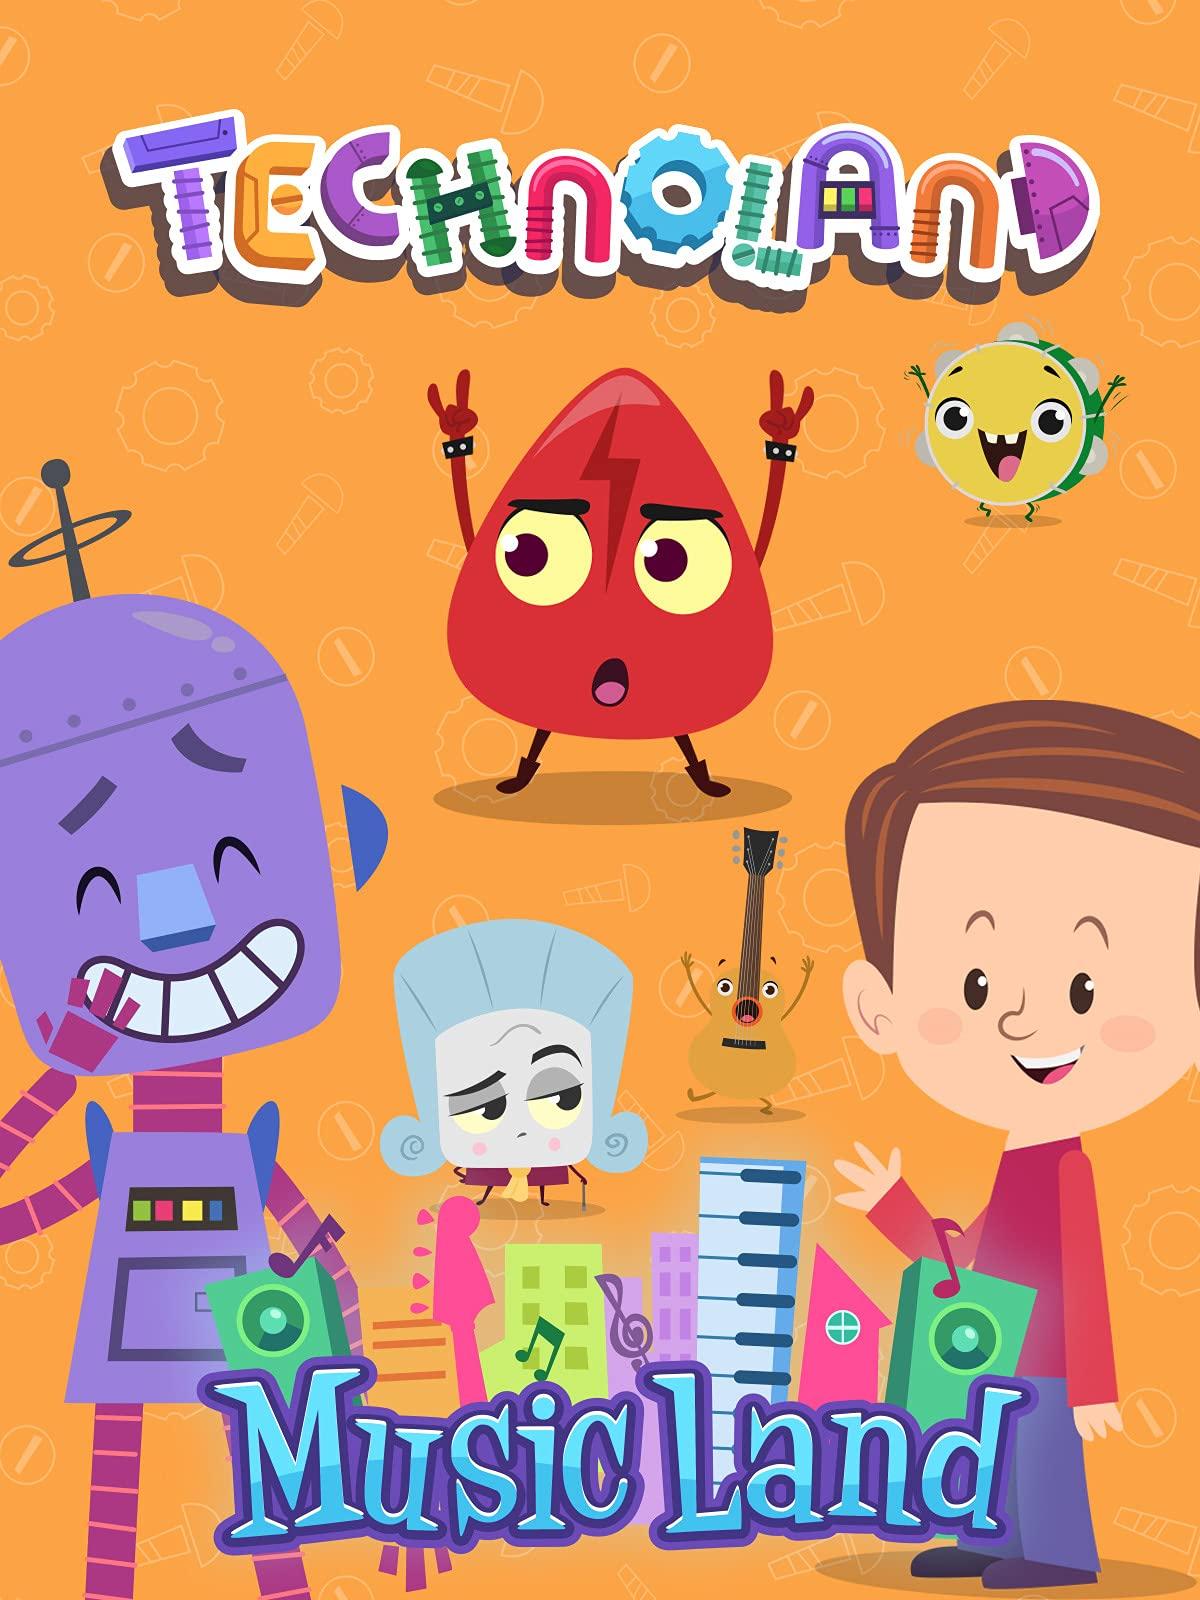 Technoland Musicland